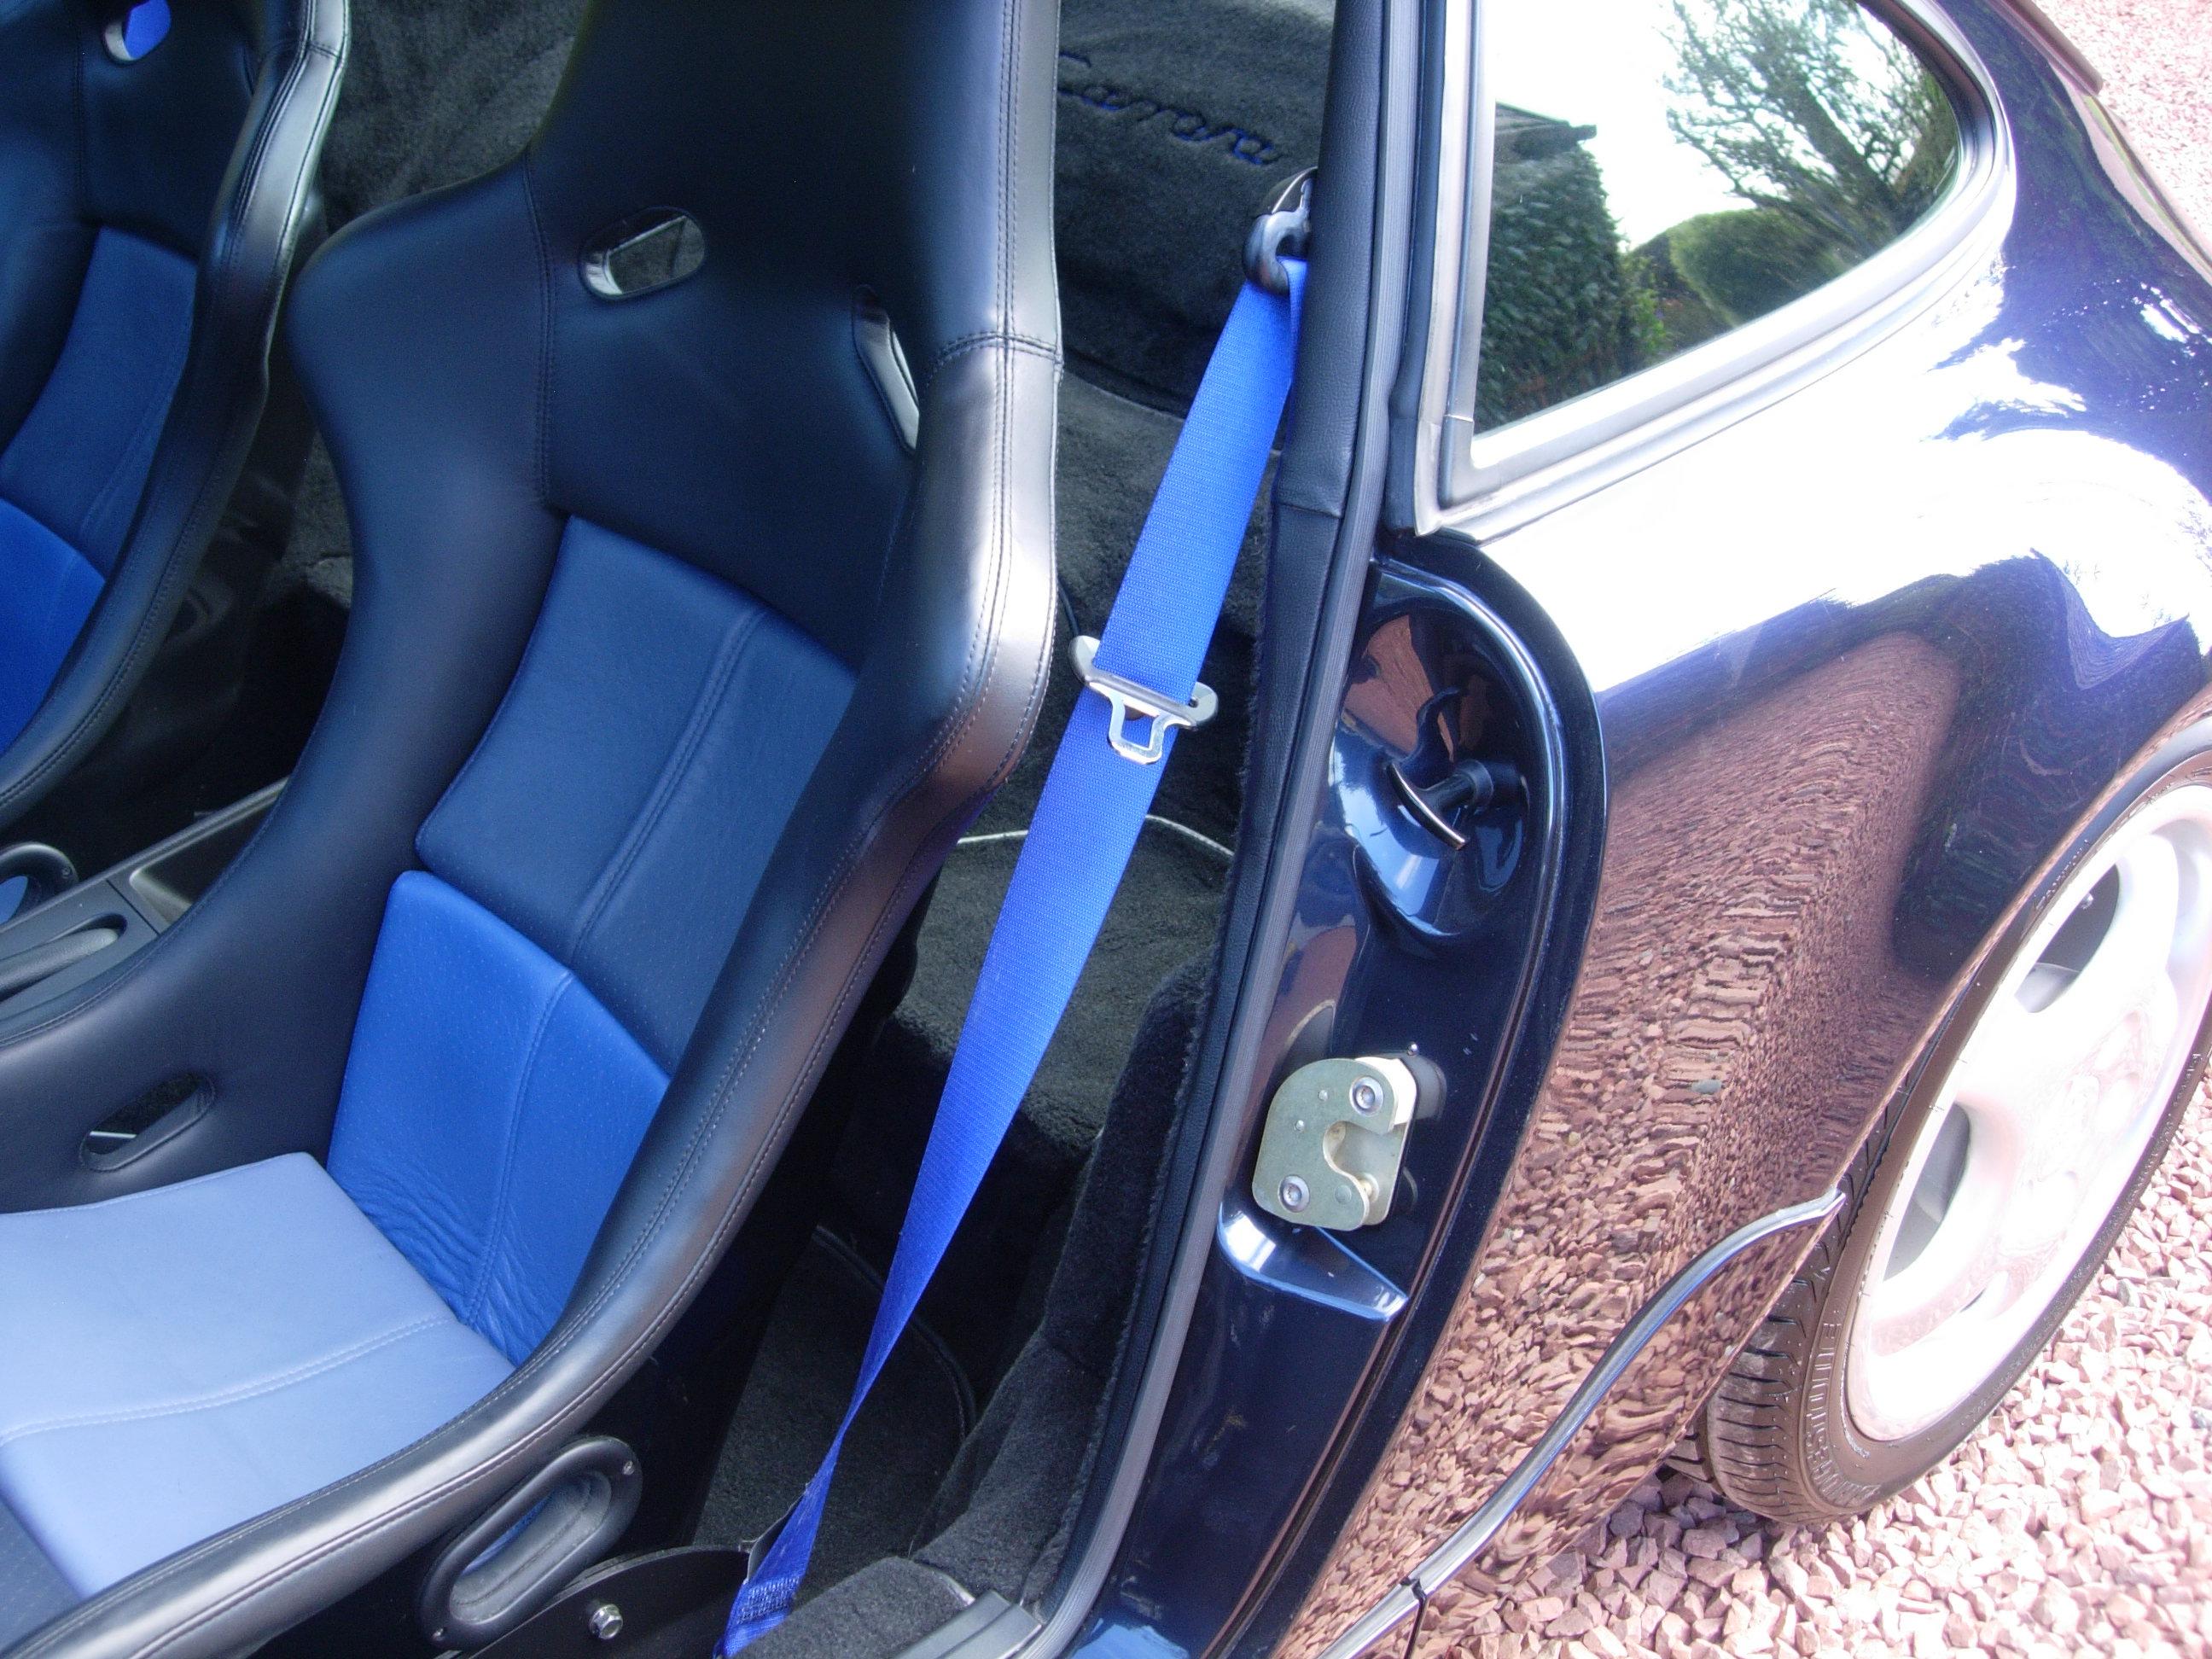 3 seatbelt